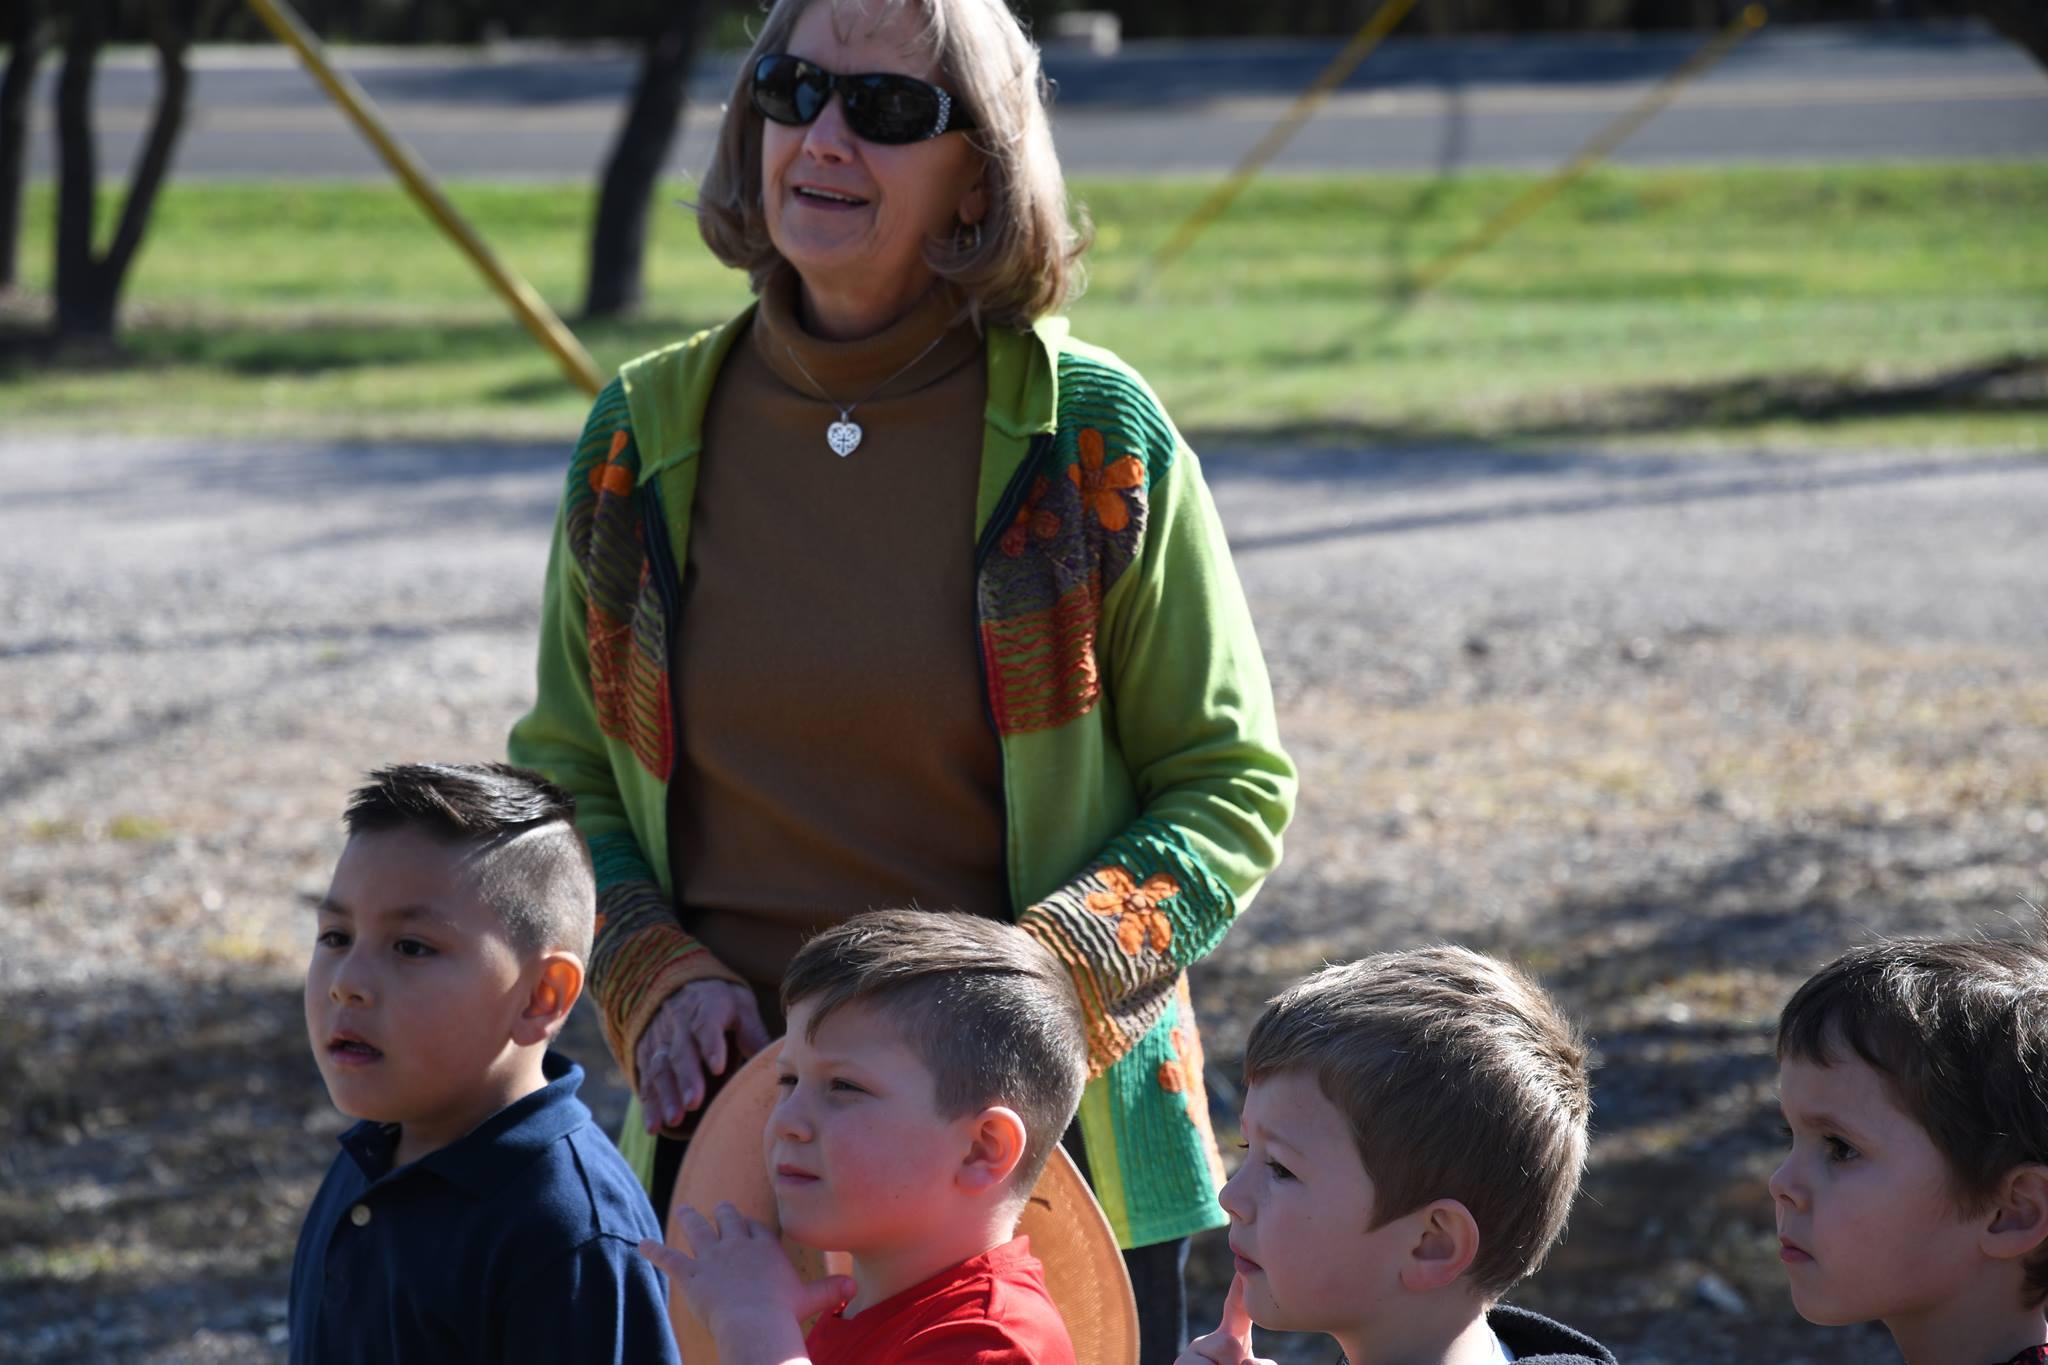 Mrs. Kathy Pitts